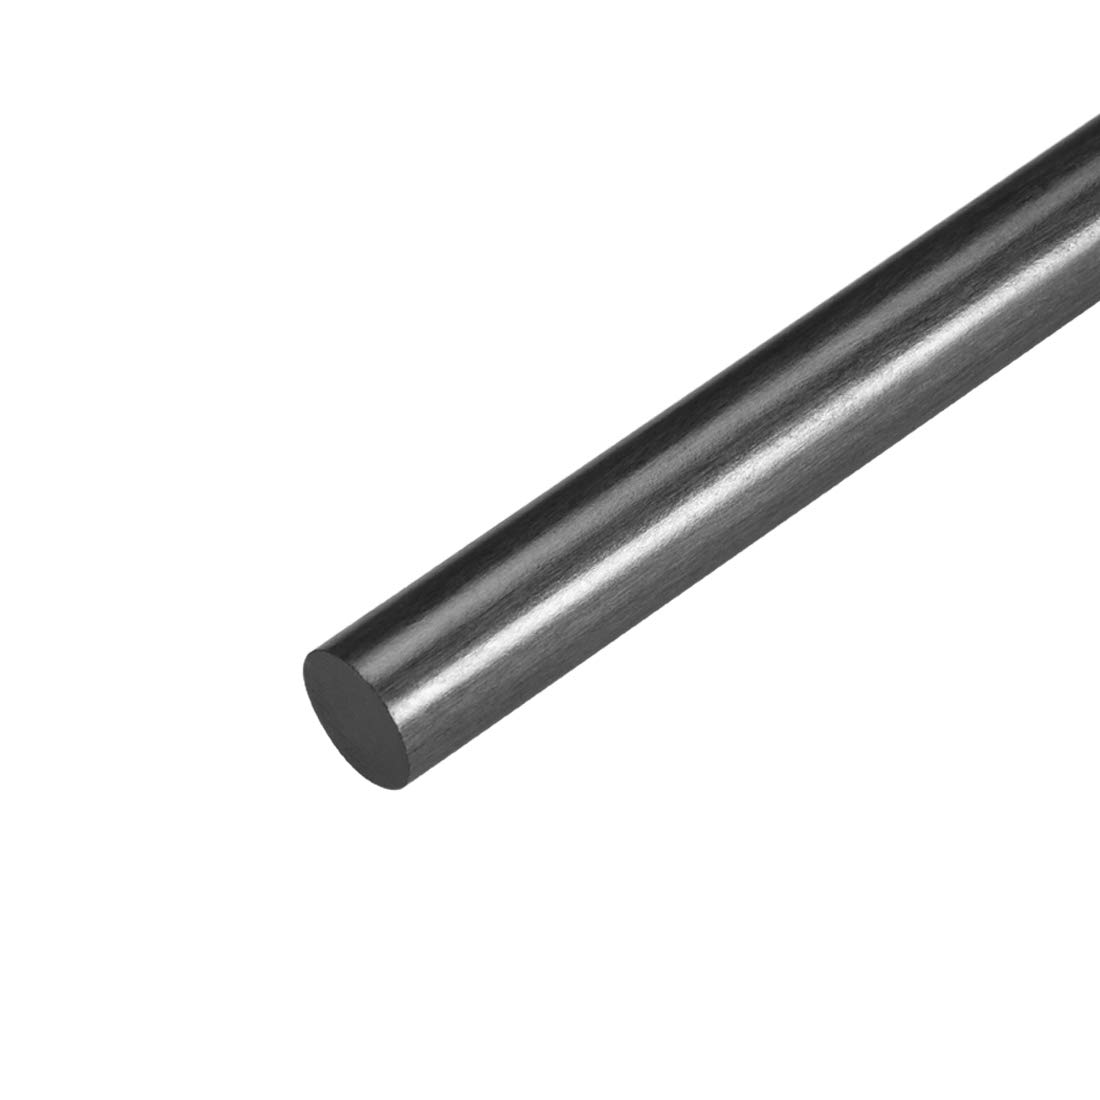 sourcing map 3mm Carbon Fiber Bar For RC Airplane Matte Pole US, 200mm 7.8 inch, 5pcs